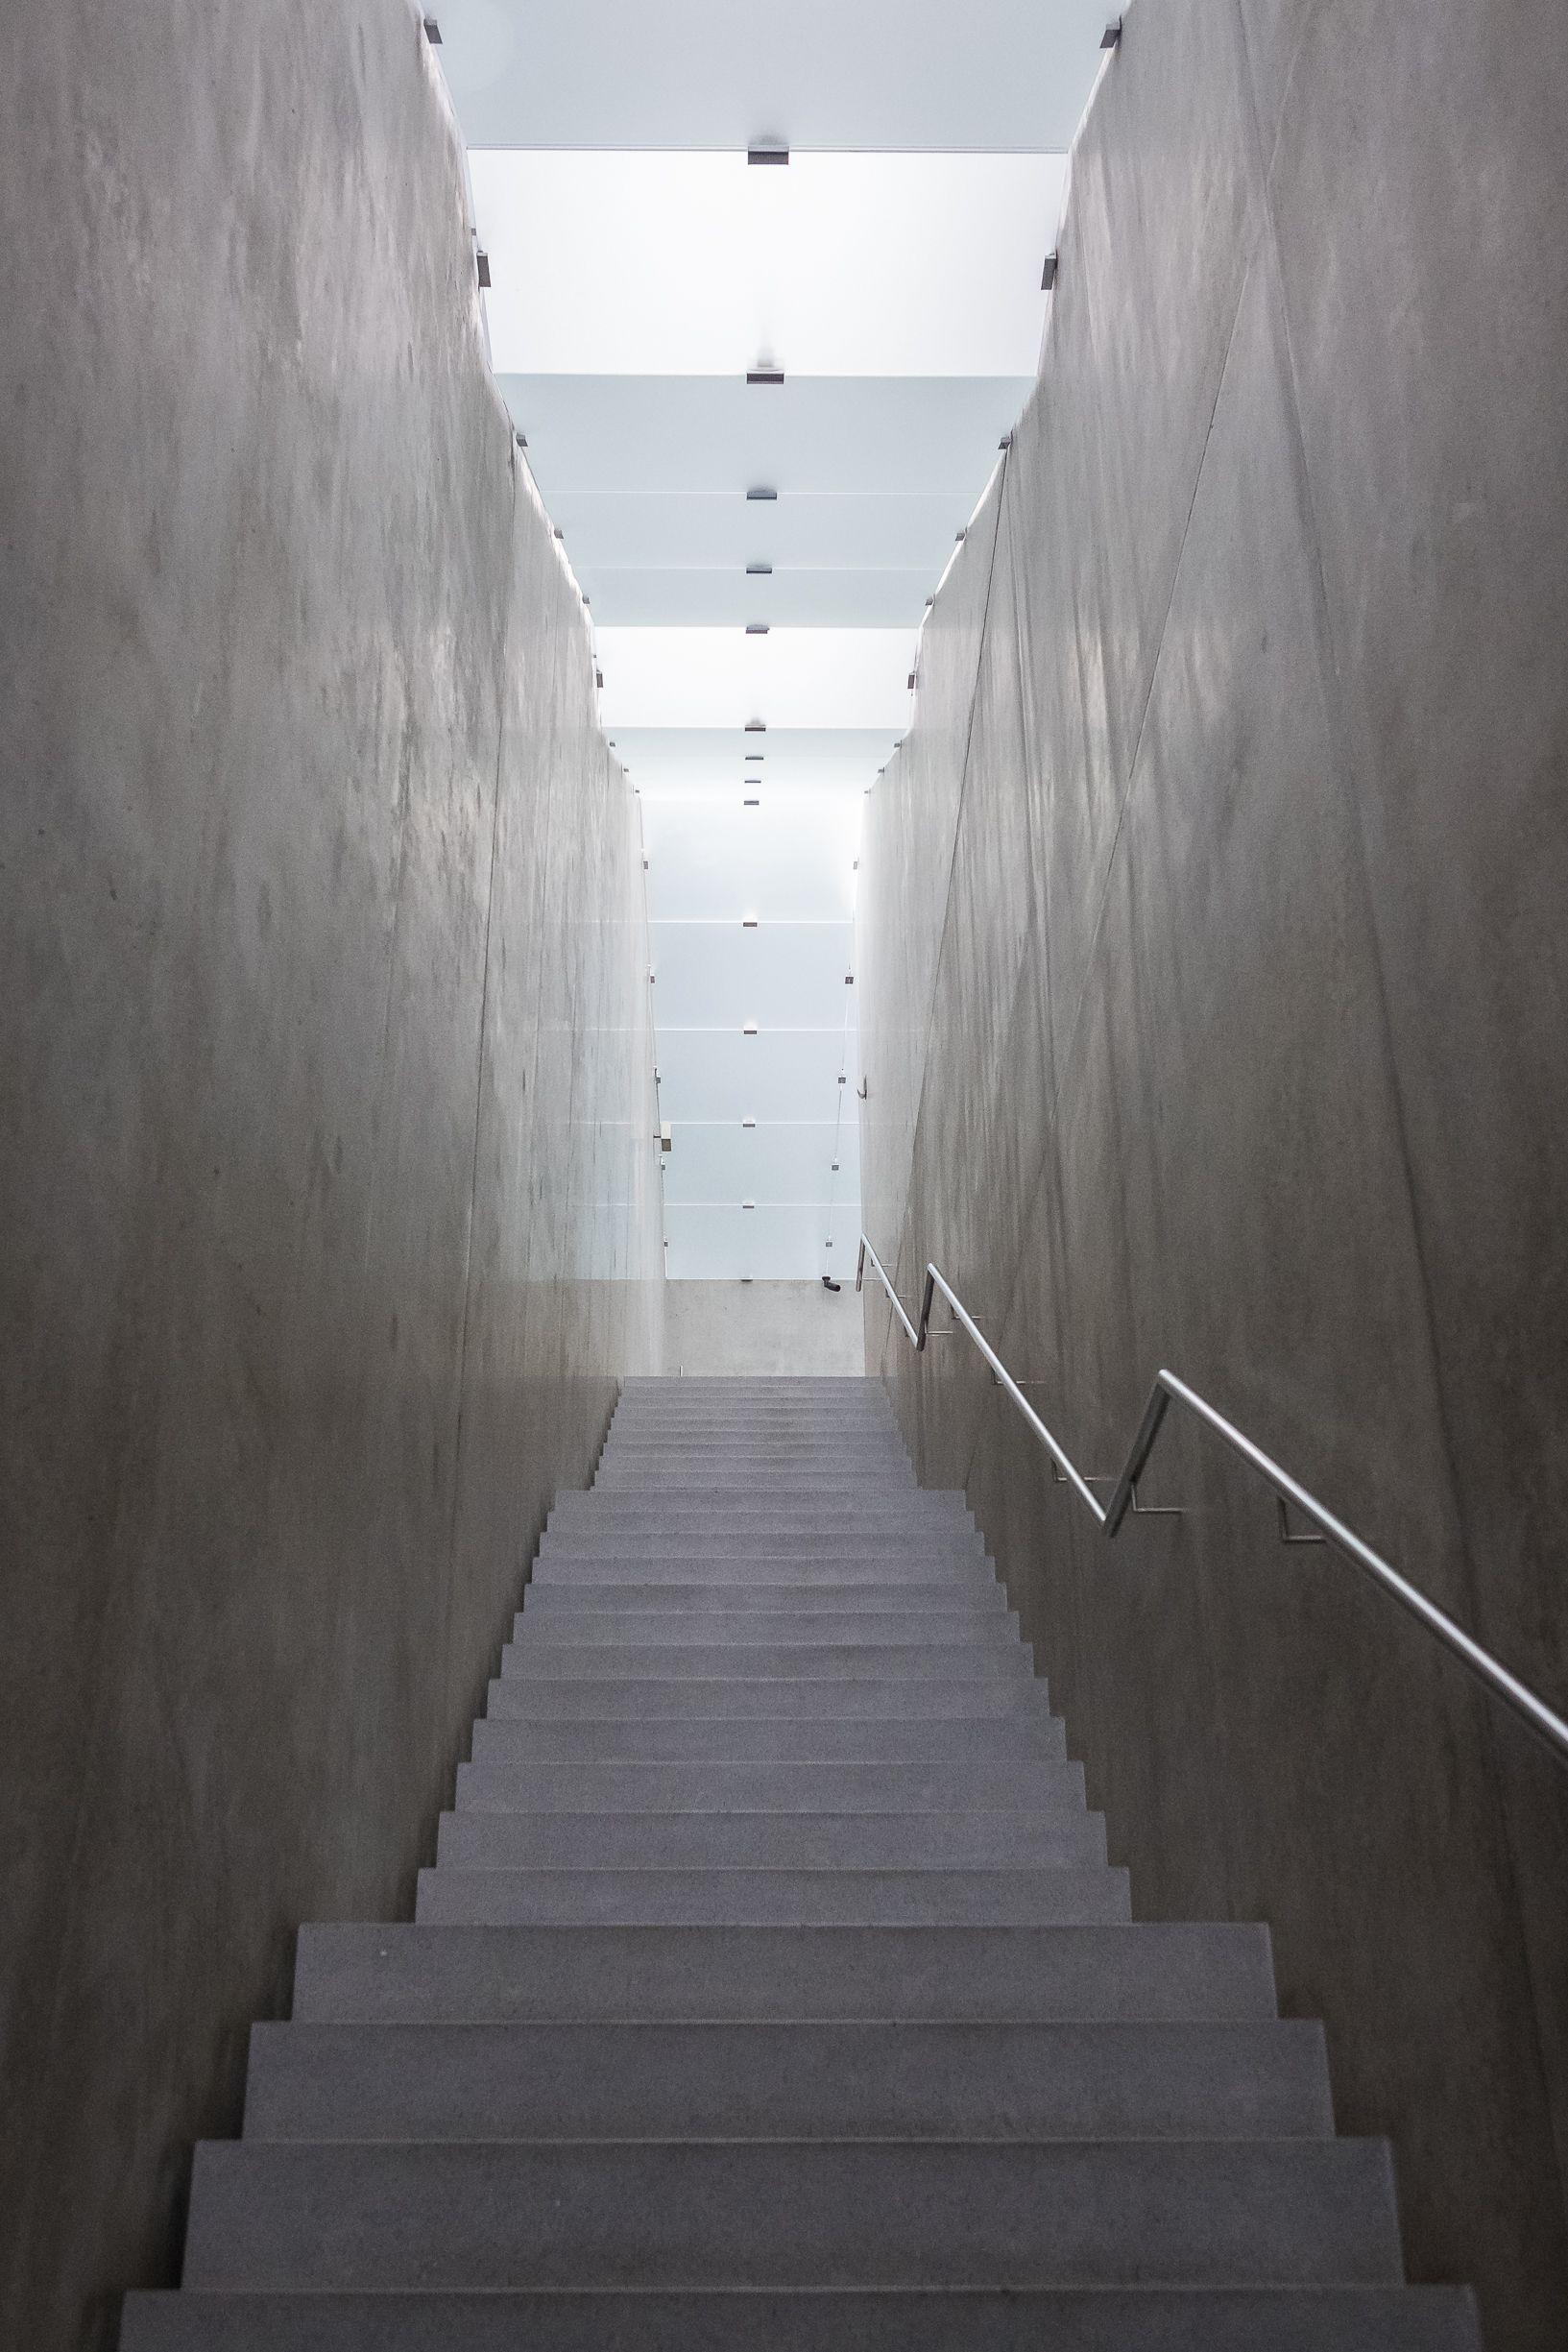 Lichtdecke Treppe - Kunsthaus Bregenz - Peter Zumthor | 351 Treppen ...